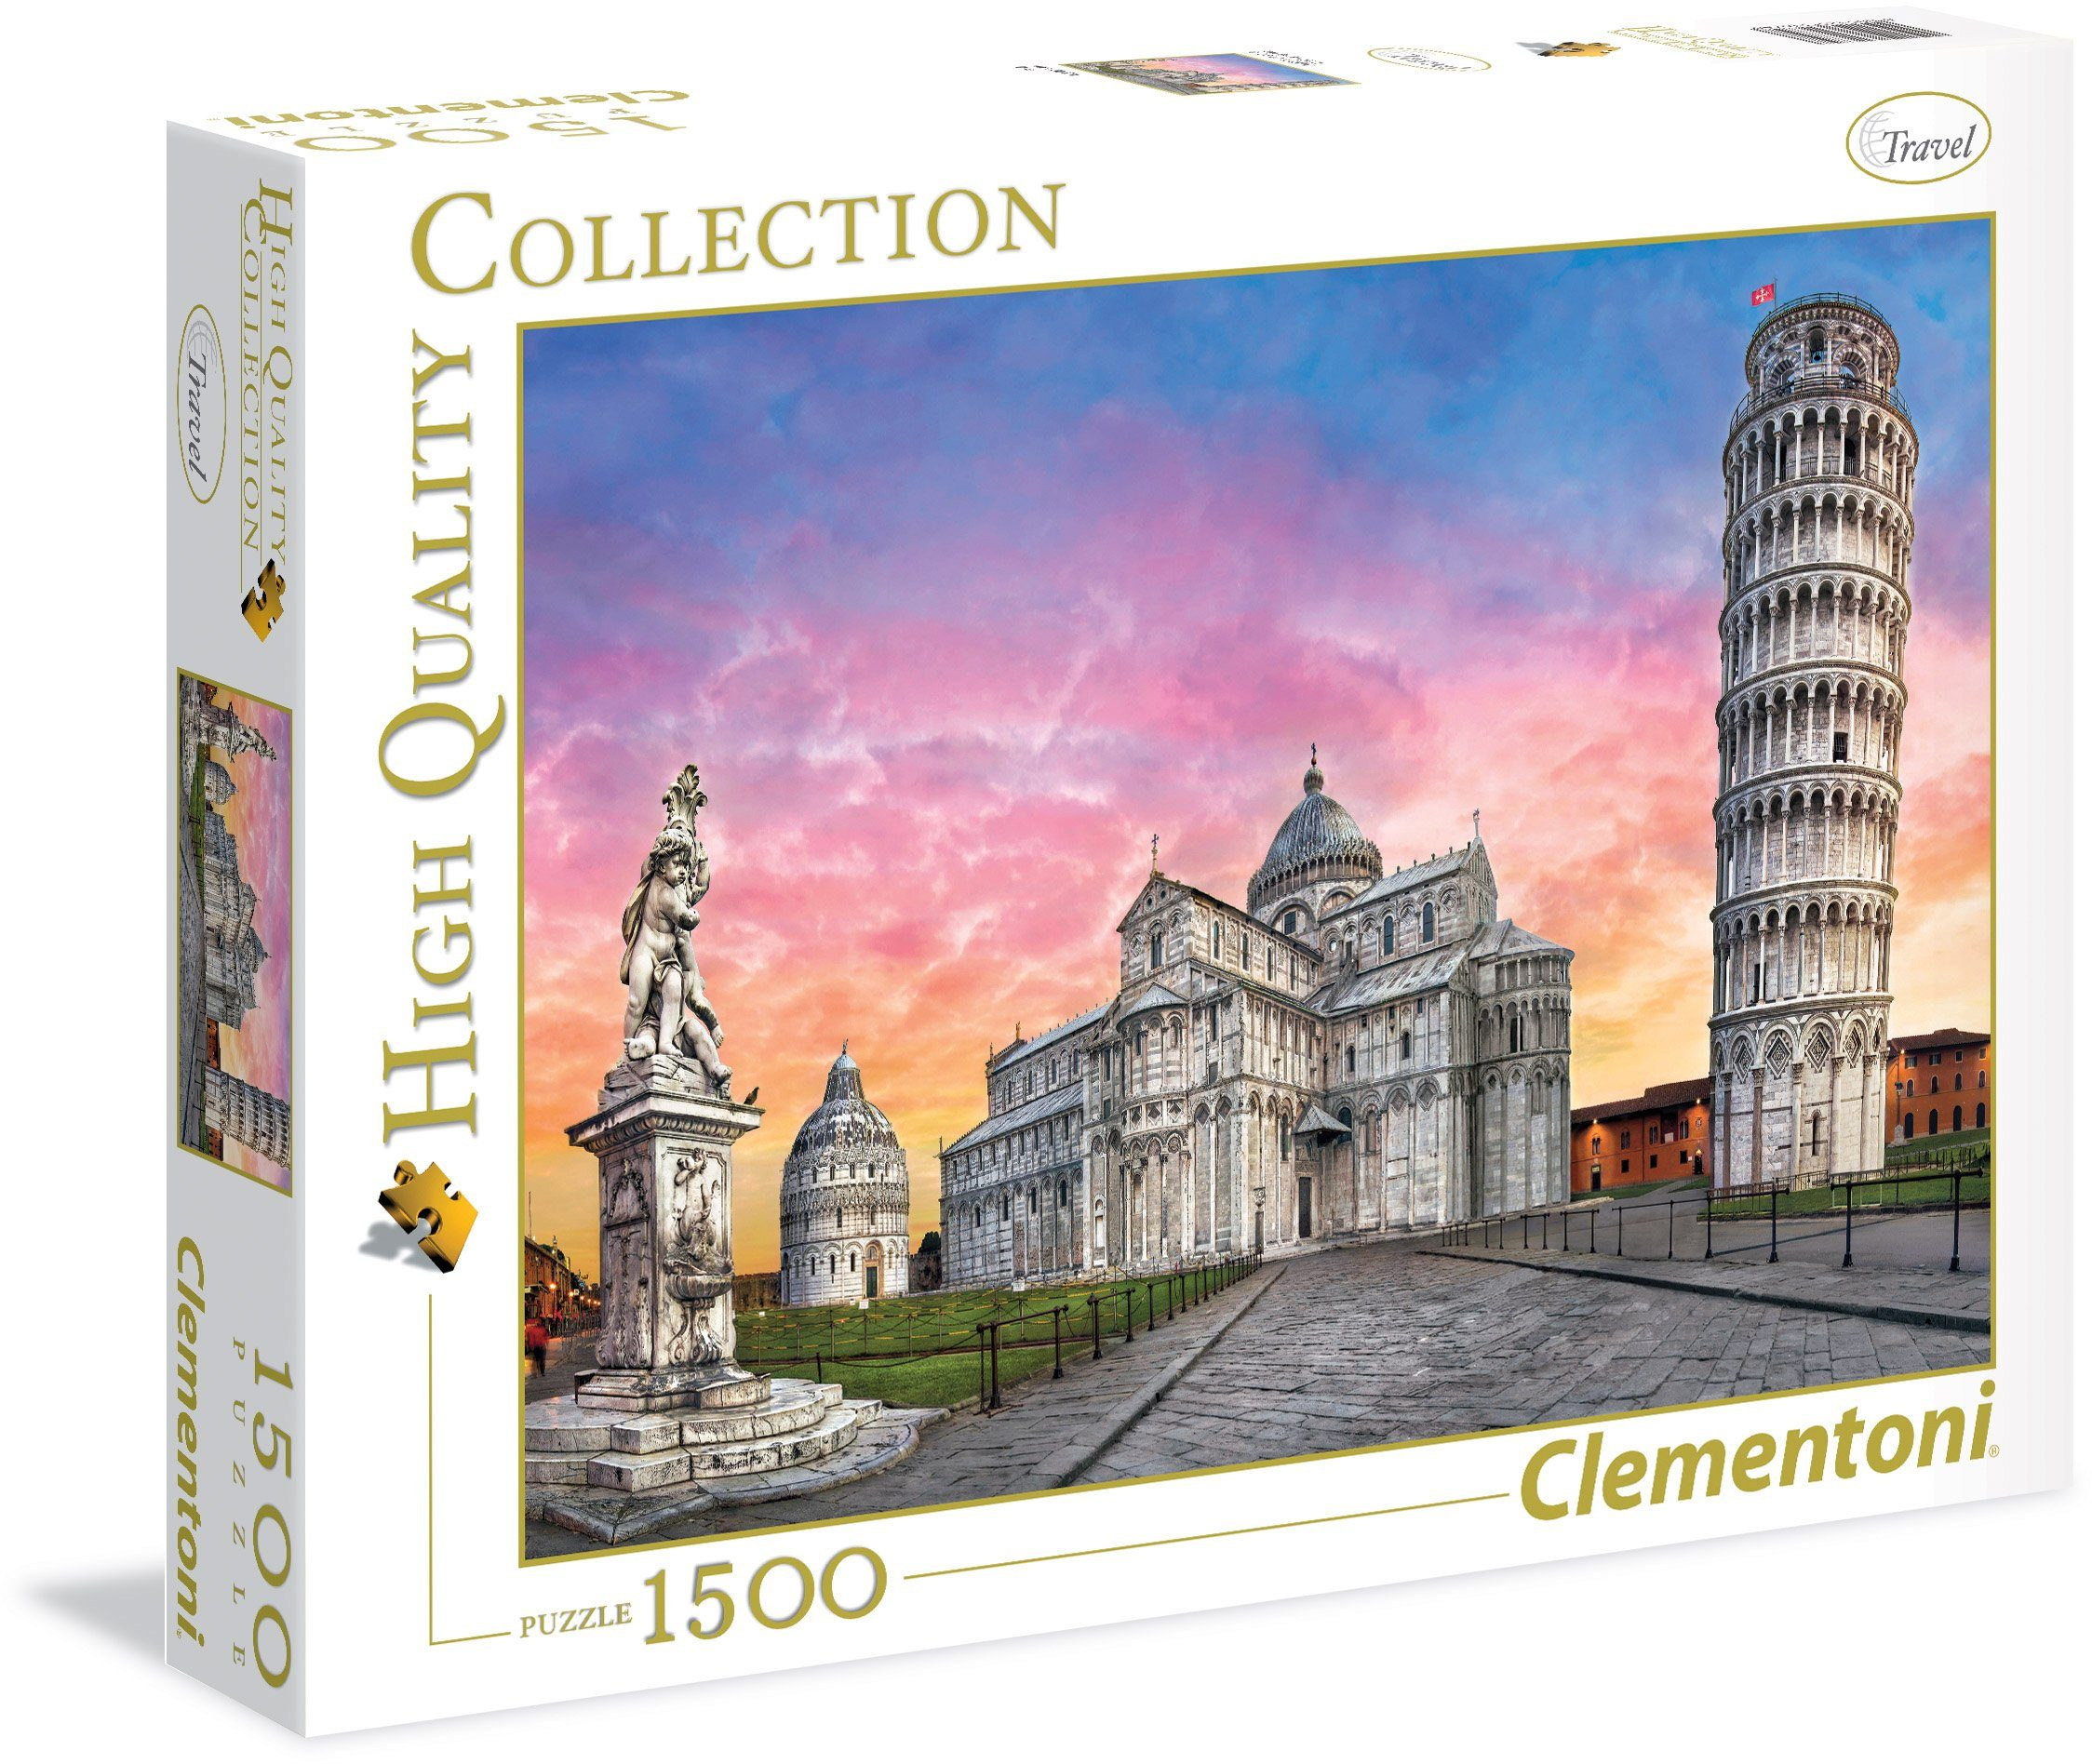 Clementoni Puzzle, 1500 Teile, »Pisa«